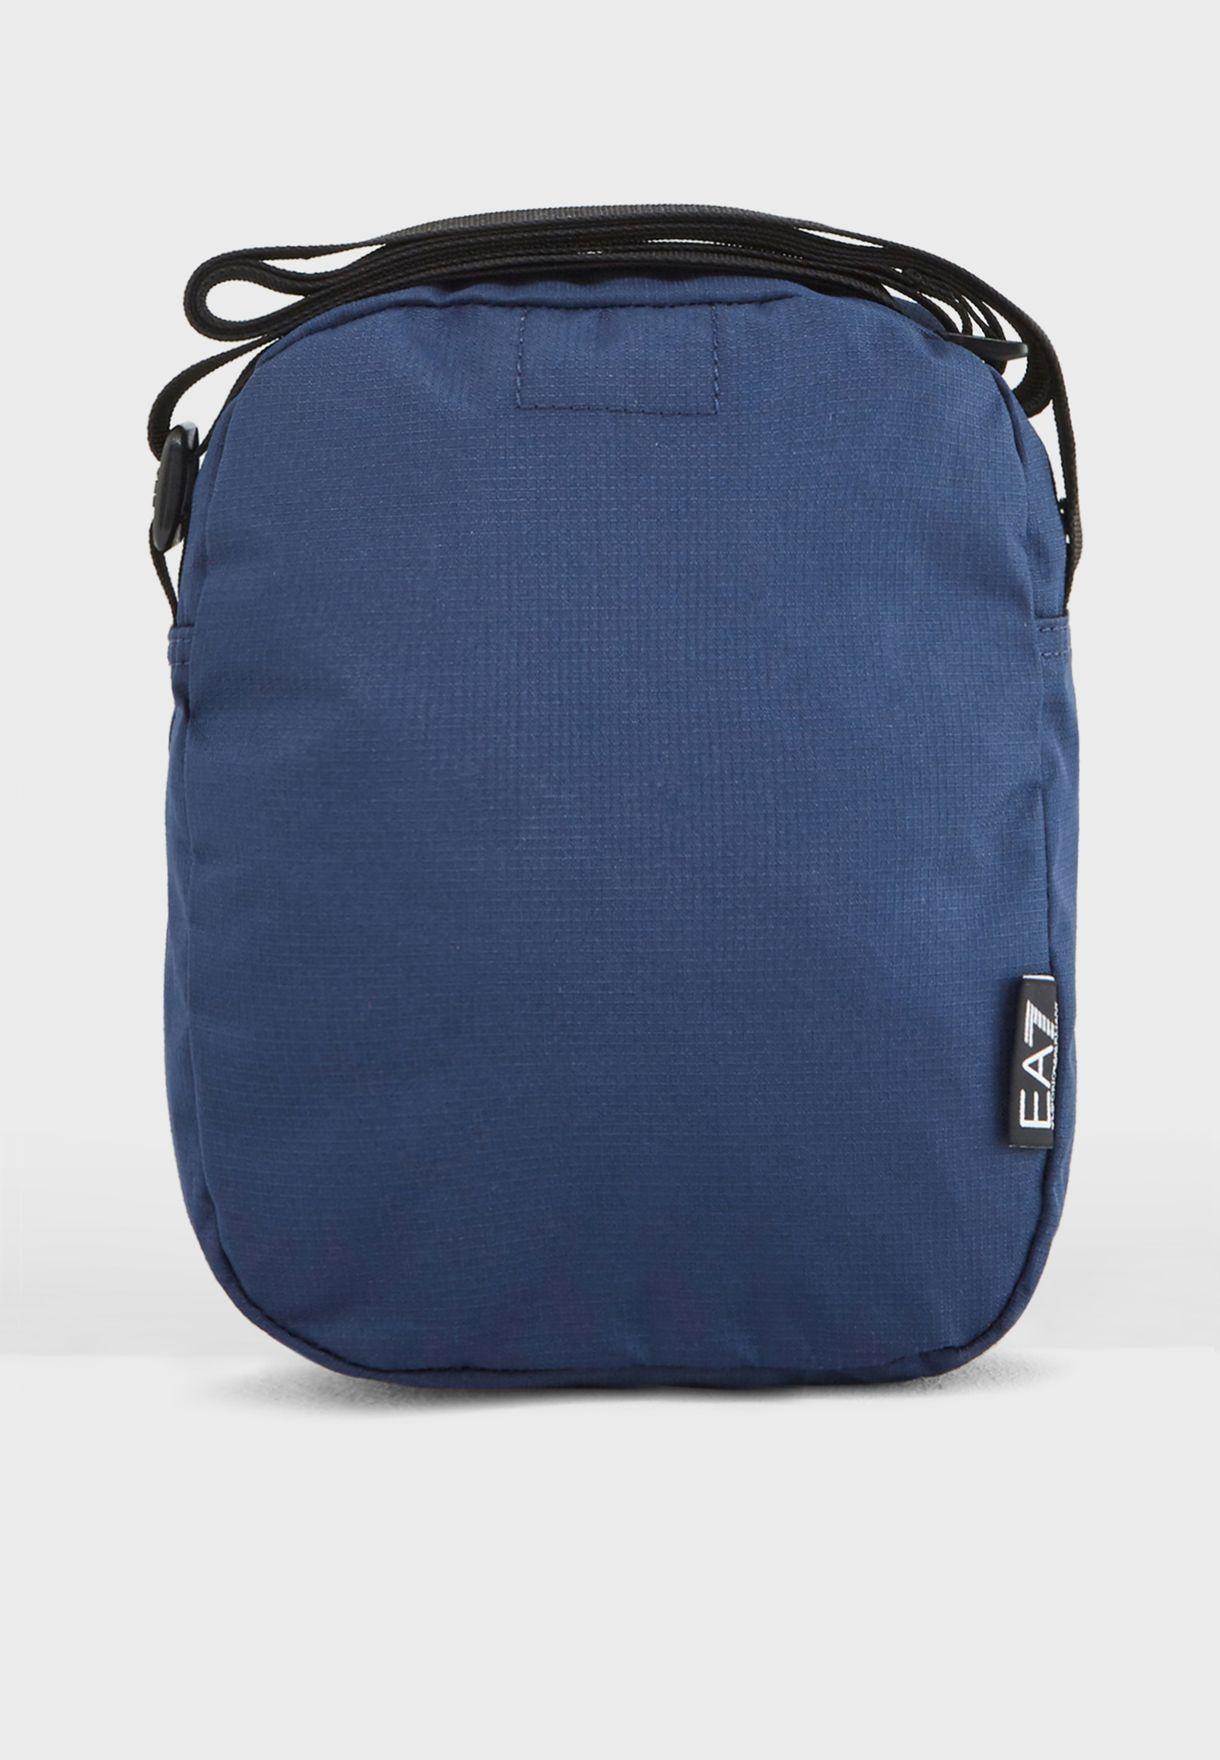 Train Prime Pouch Bag